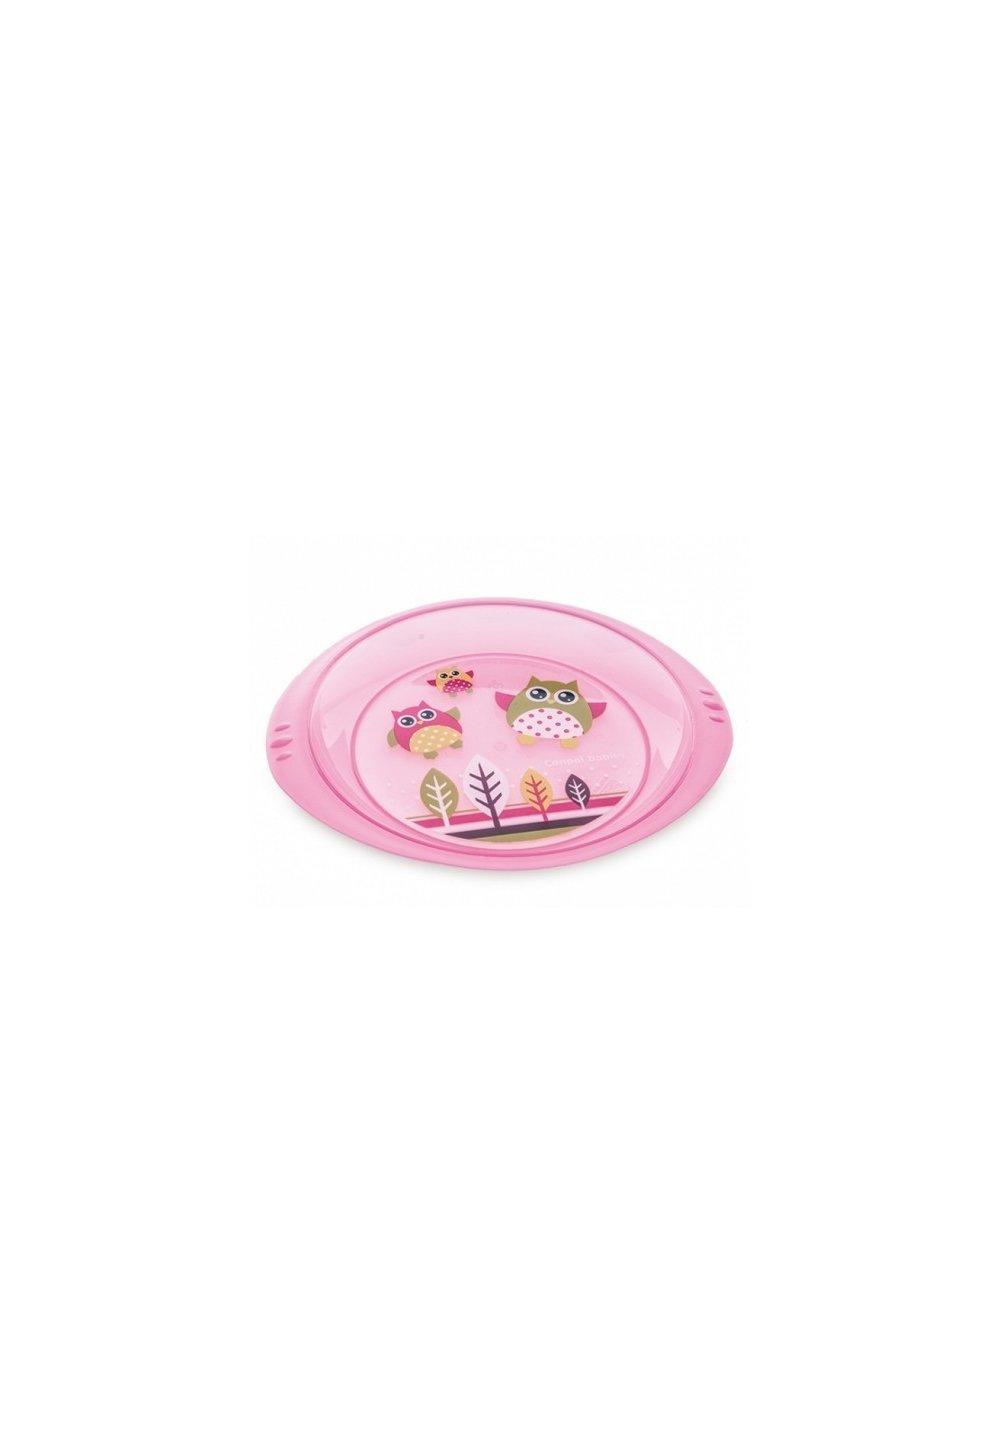 Farfurie bufnita, roz imagine